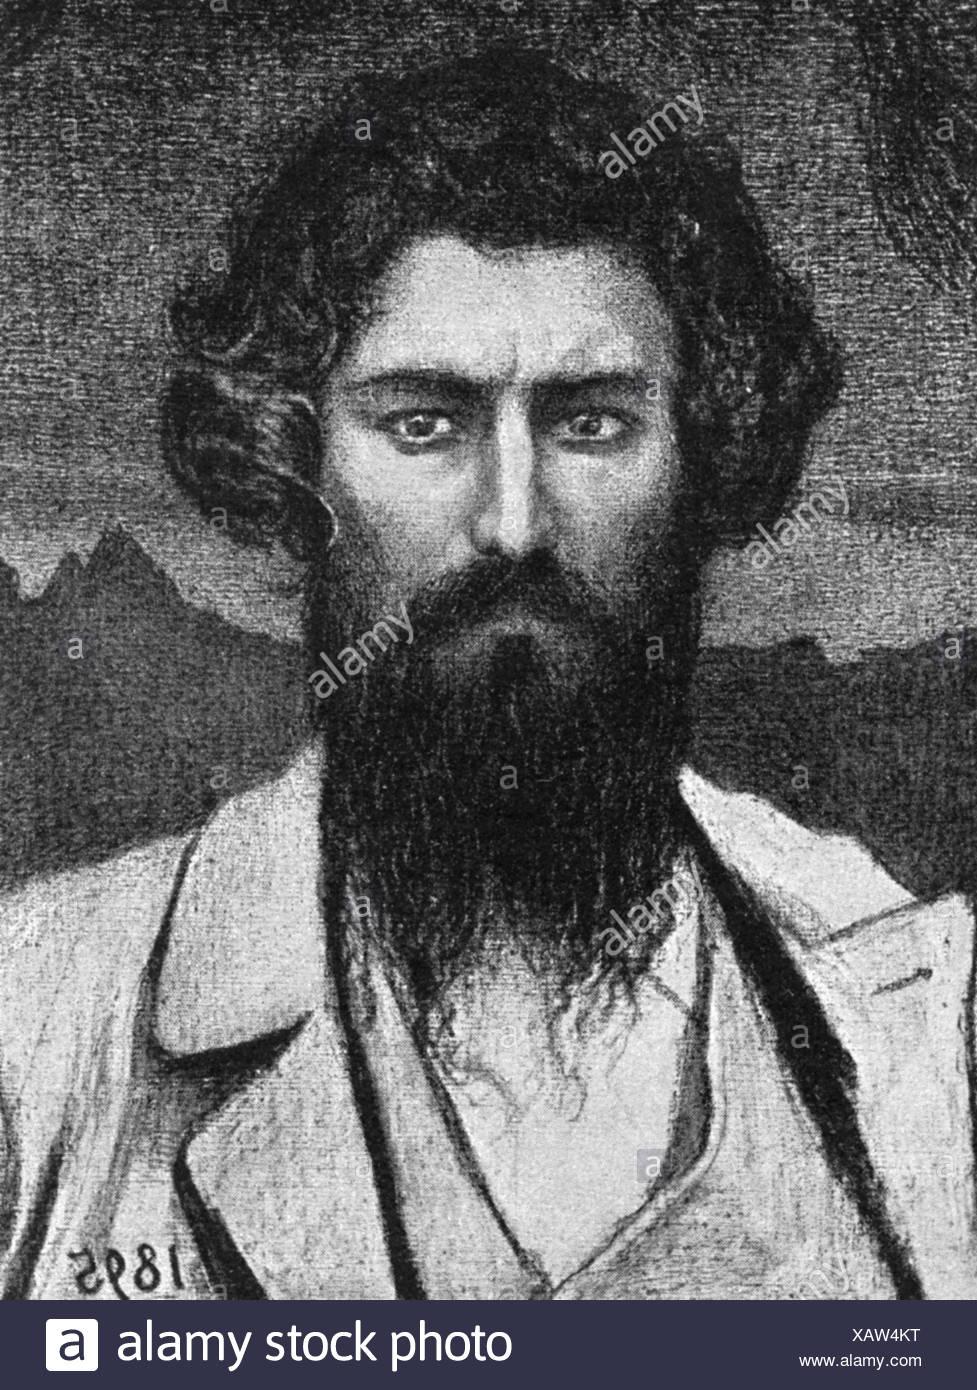 Segantini, Giovanni, 15.1.1858 - 28.9.1899, Italian painter, self-portrait, 1895, Additional-Rights-Clearances-NA - Stock Image